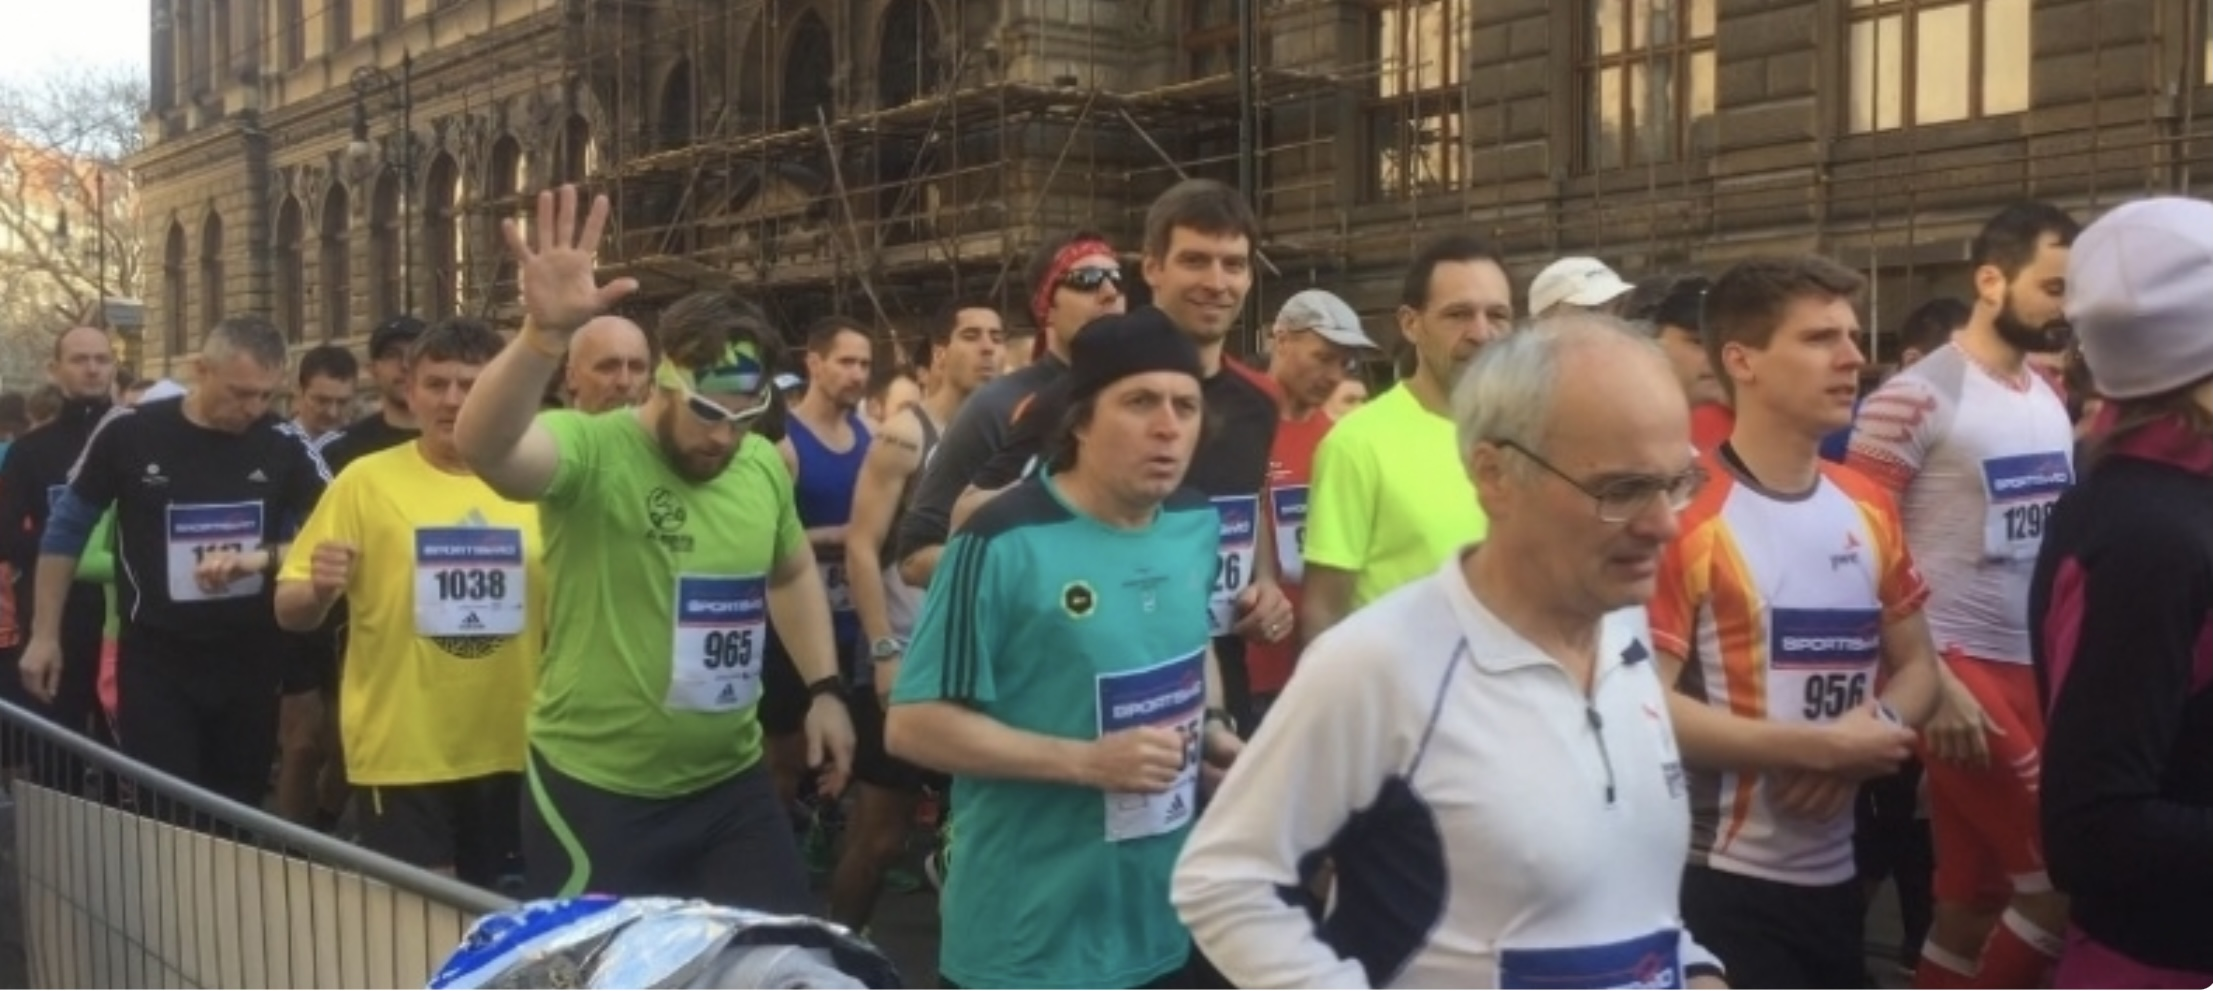 Půlmaraton, den a týden po závodě